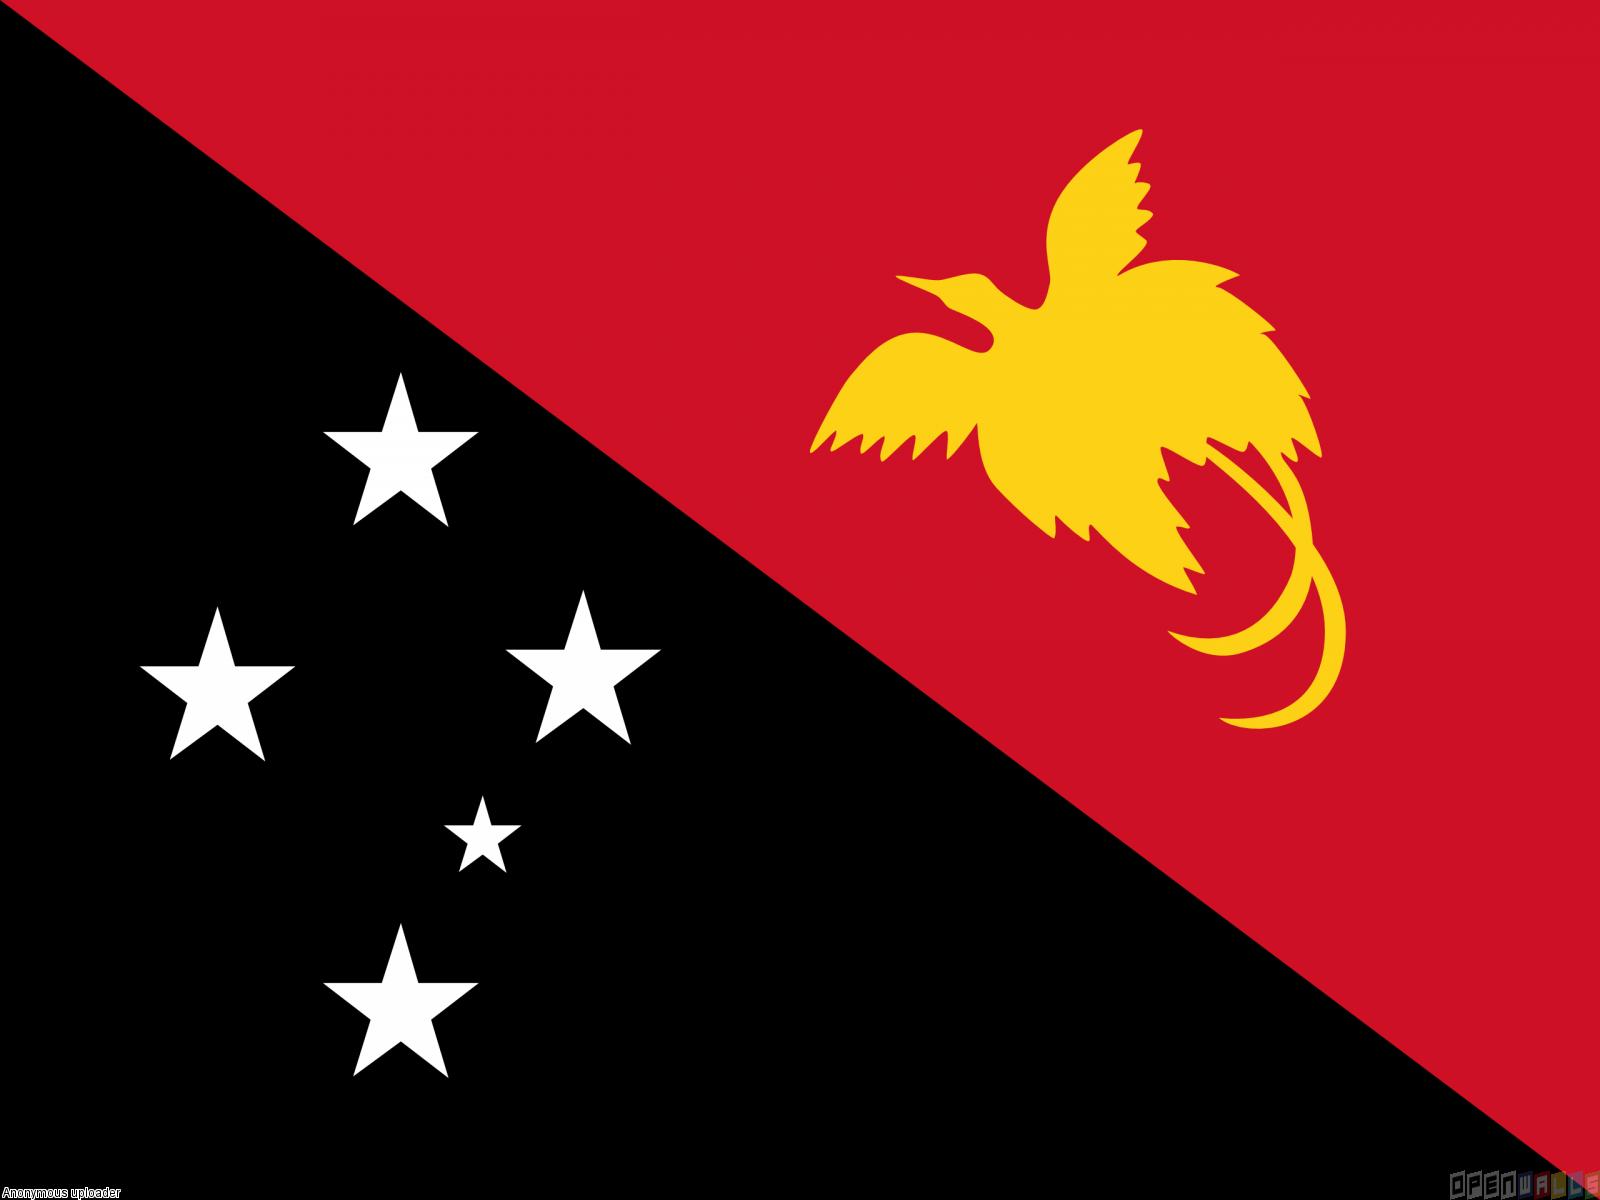 papua new guinea flag Papua new guinea flag wallpaper 20176 1600x1200